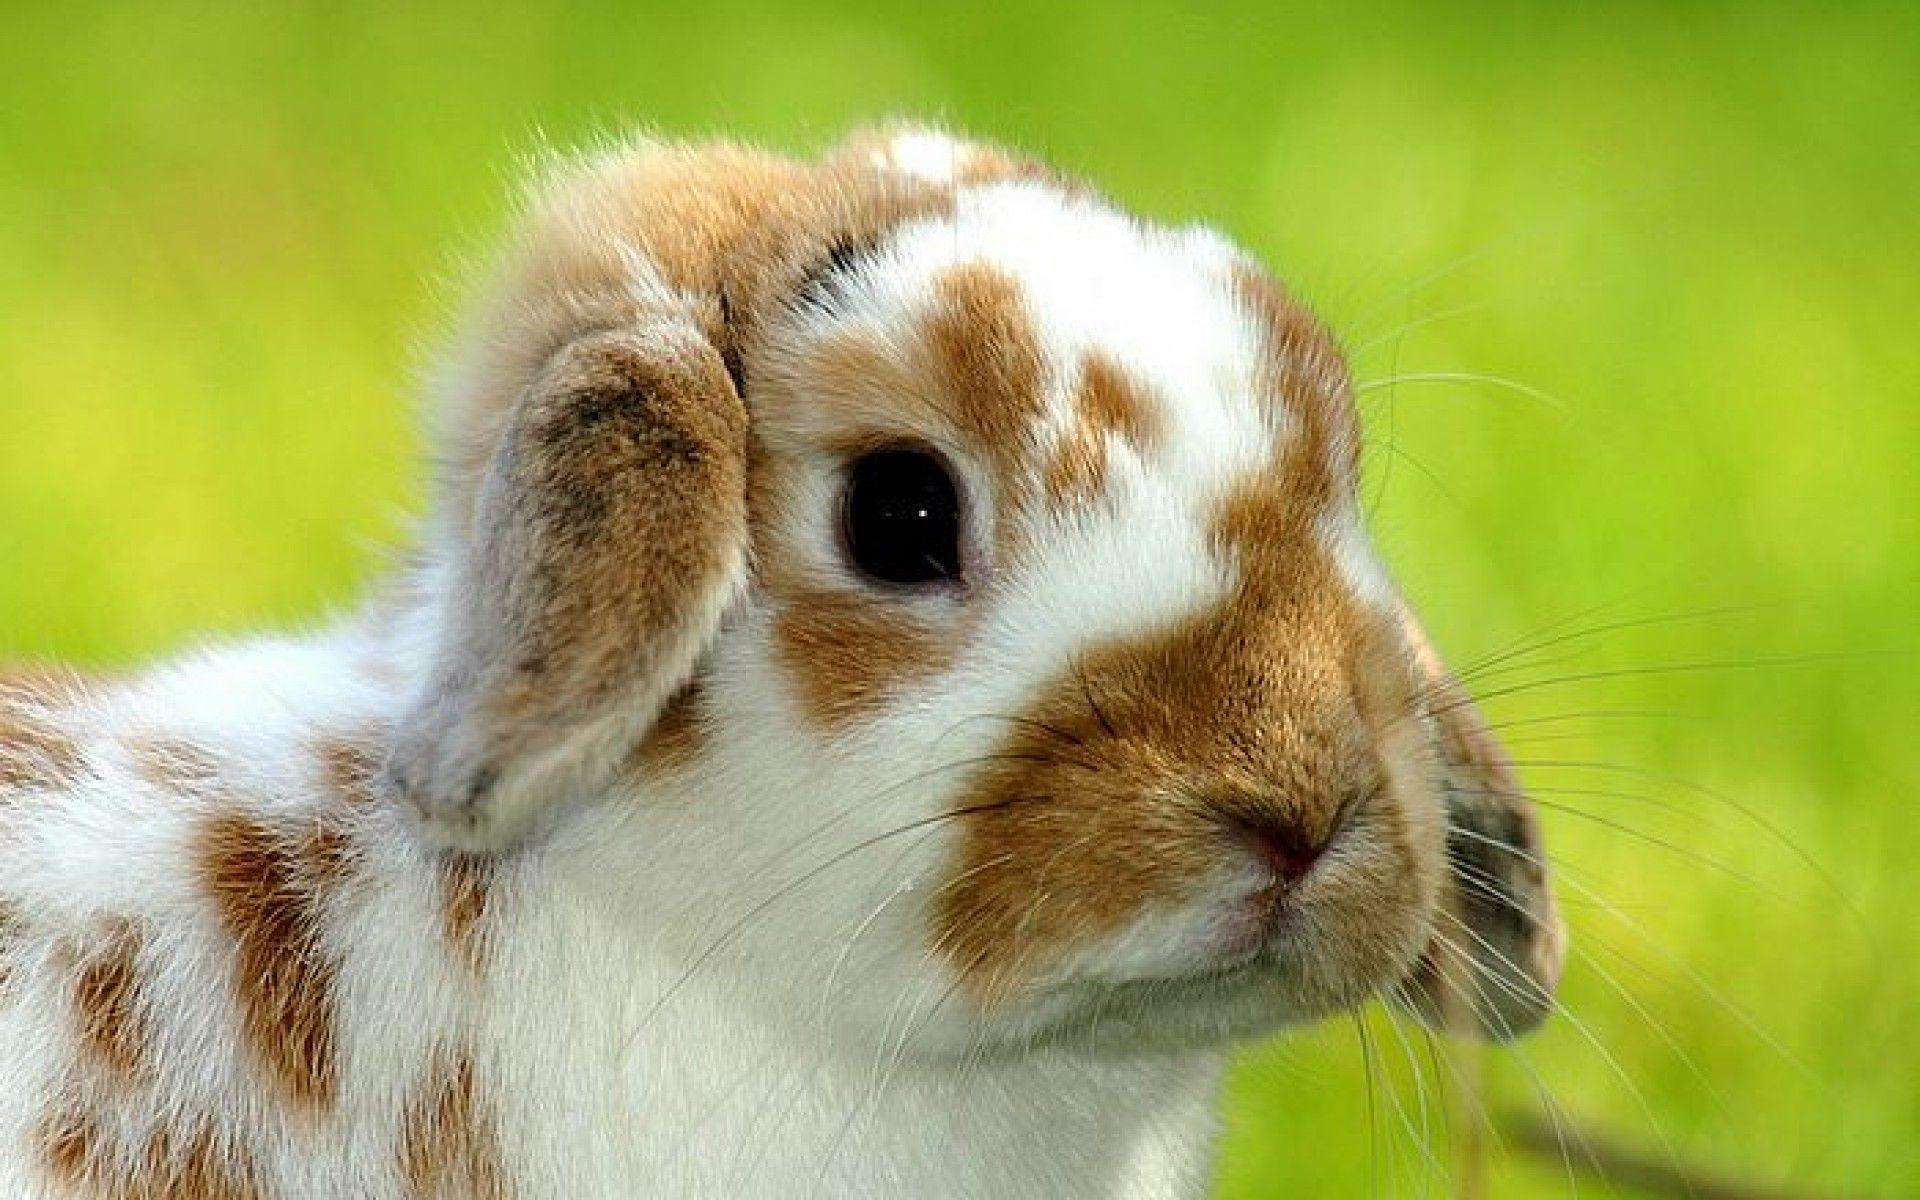 Easter Bunny Wallpaper 2 – Animal Backgrounds